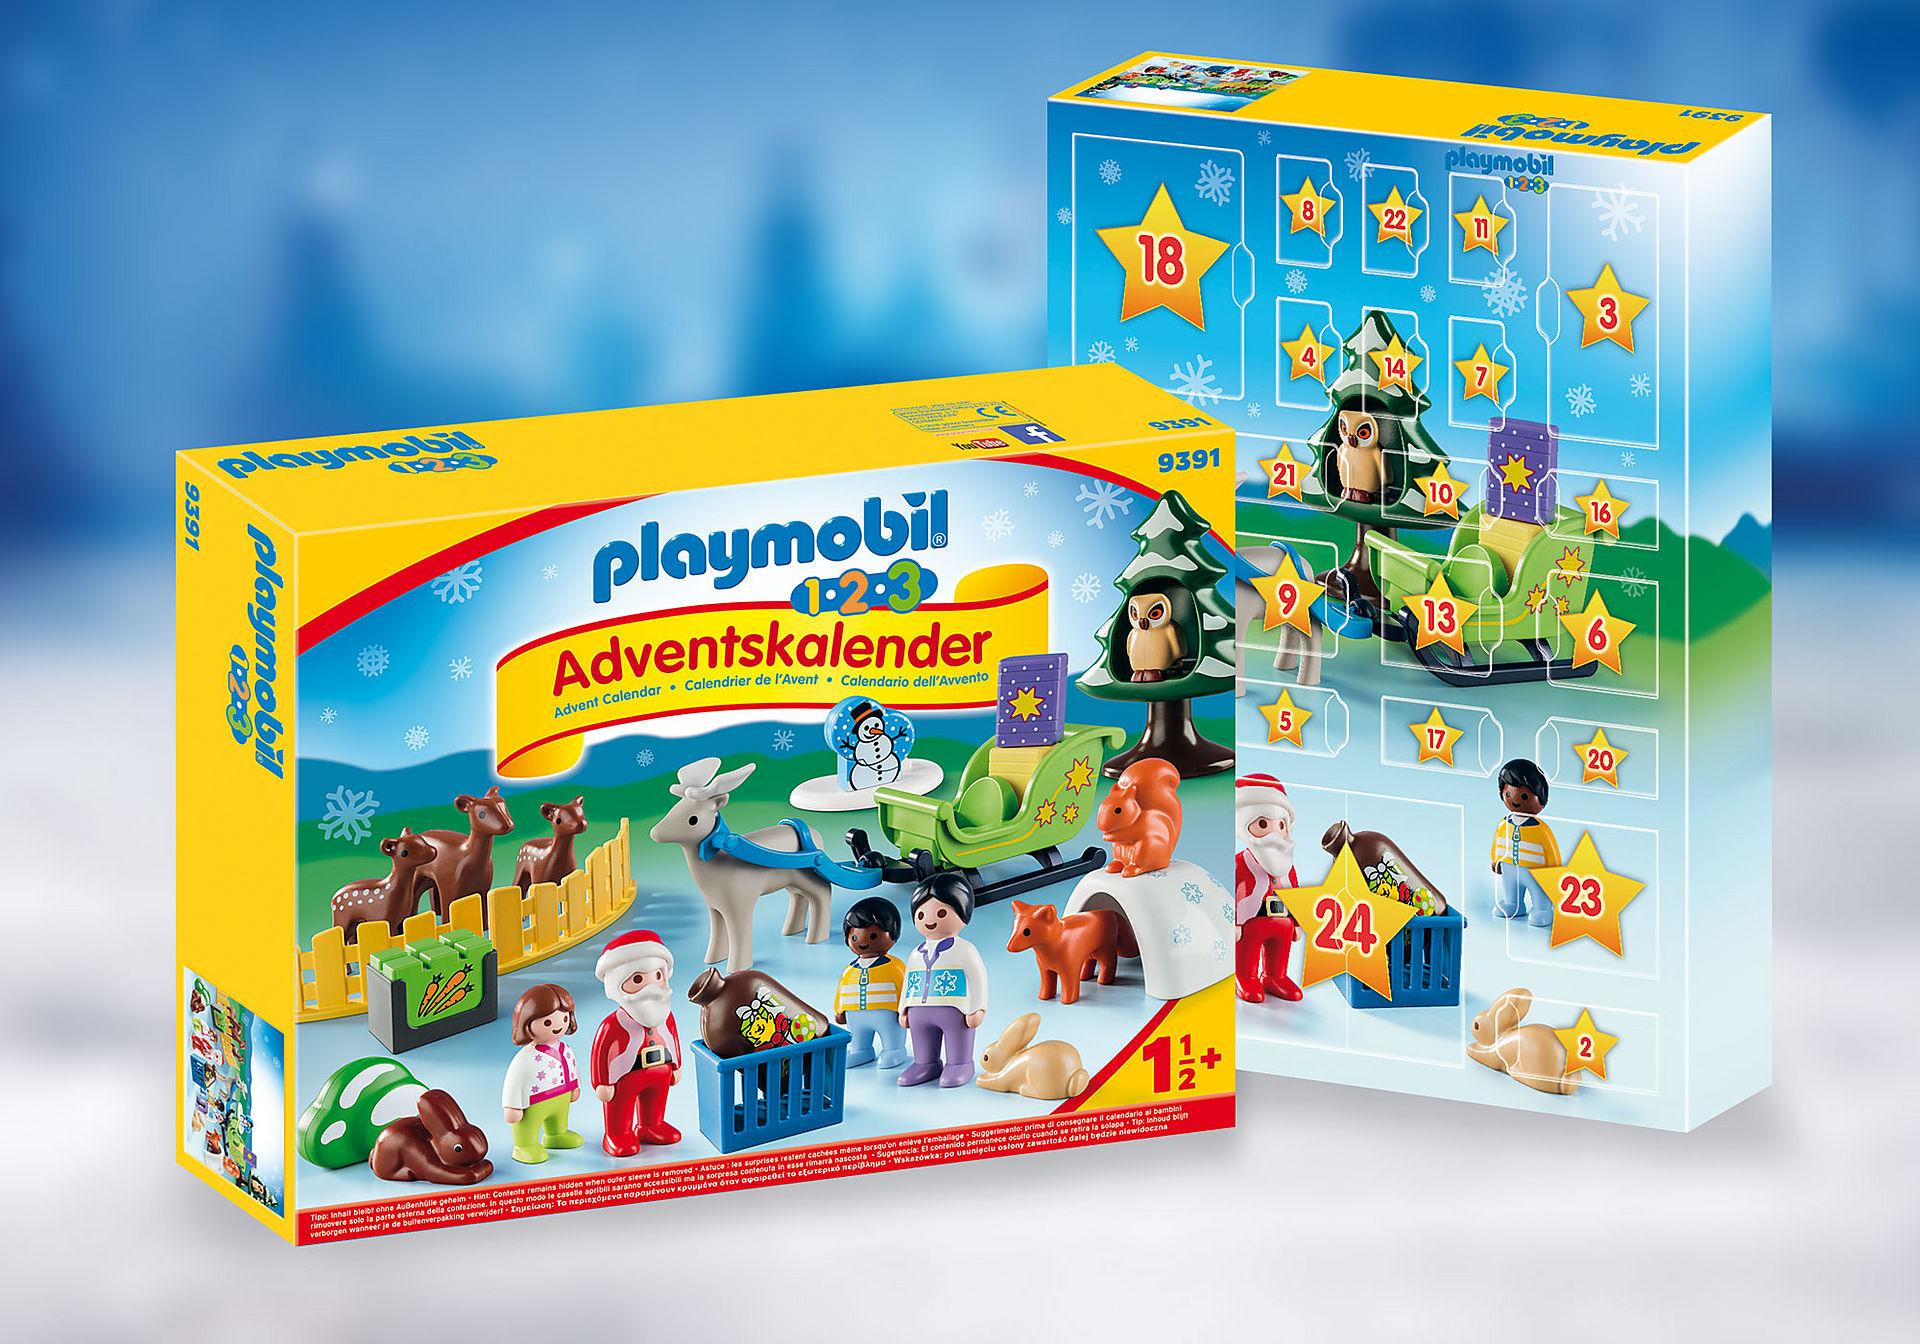 http://media.playmobil.com/i/playmobil/9391_product_detail/Calendario dell'Avvento 1.2.3 'Natale nel bosco degli animali'